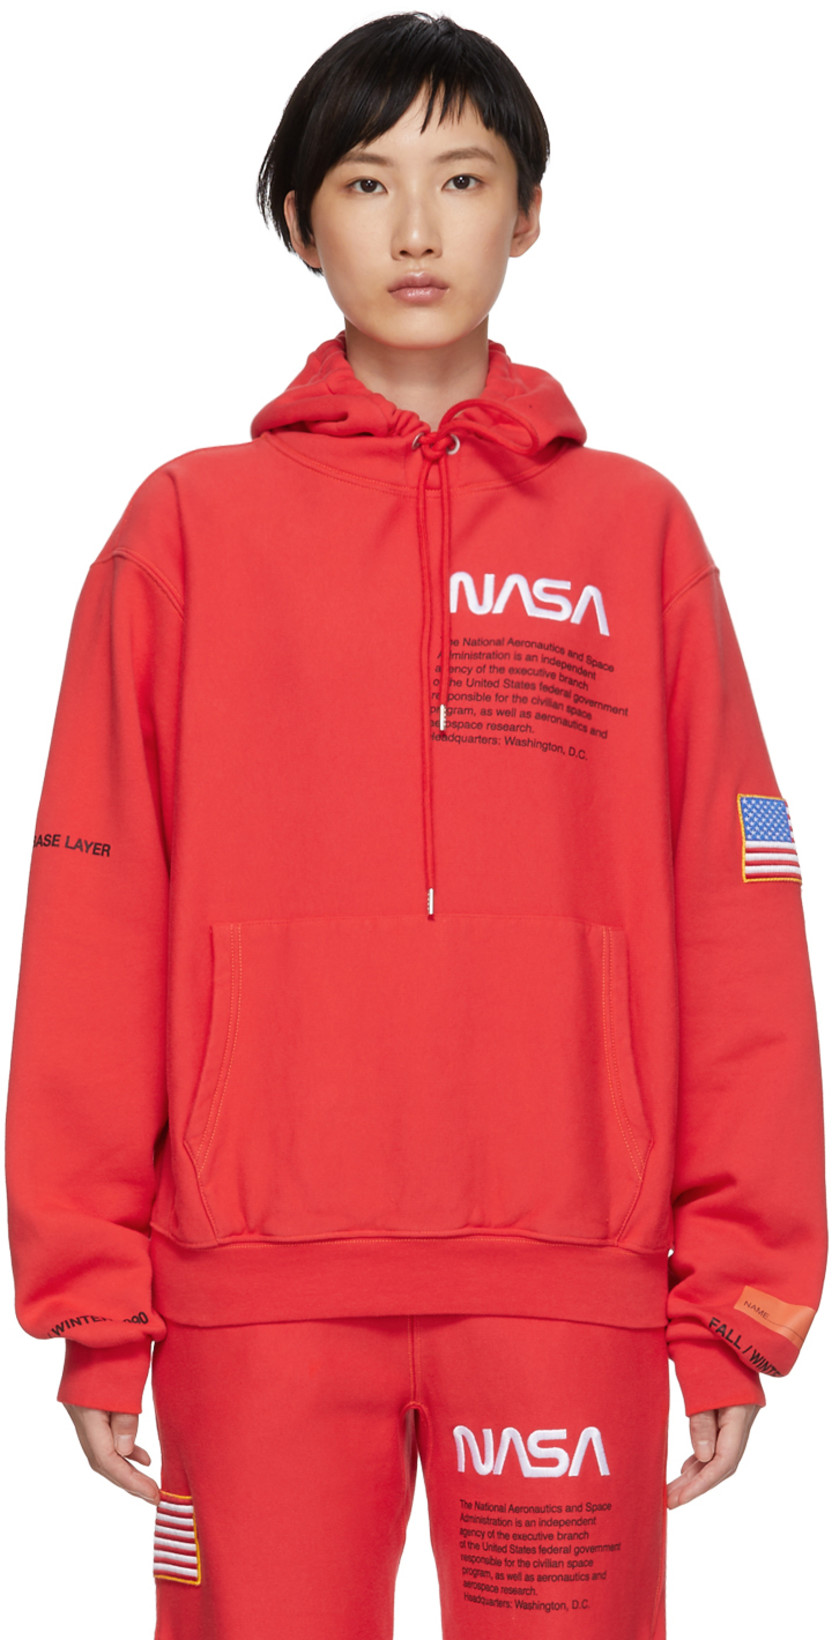 CNK-HP-NASA-4.jpg